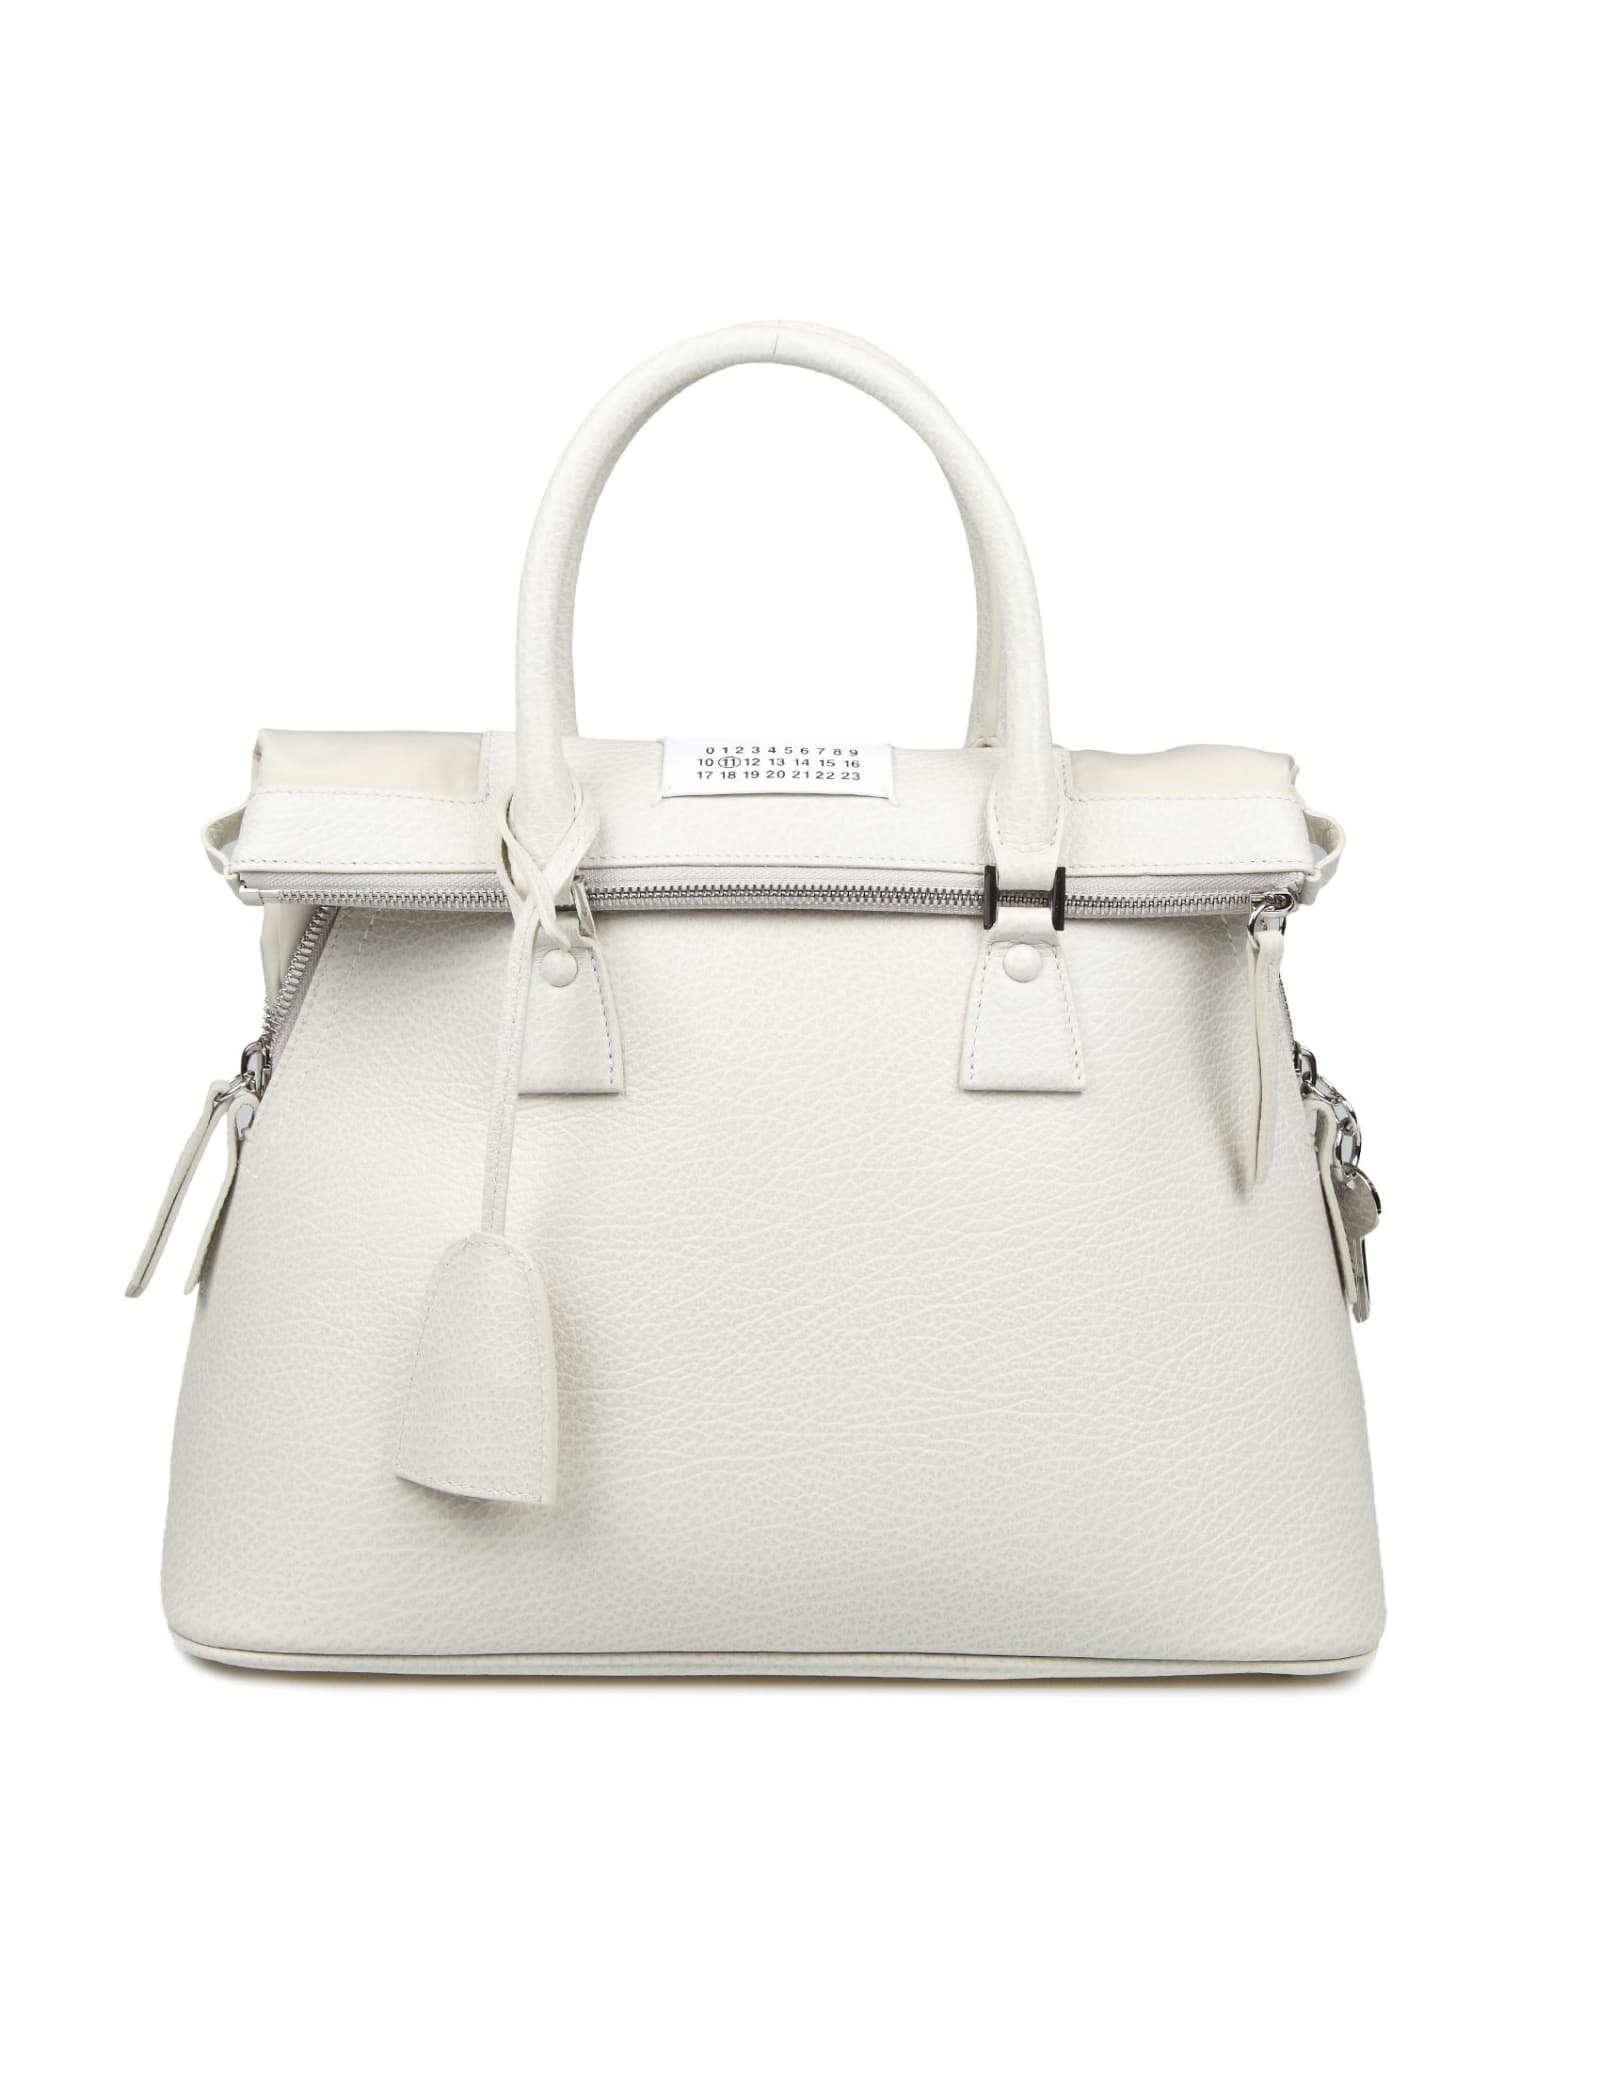 Maison Margiela 5ac Handbag In Greige Calf Leather